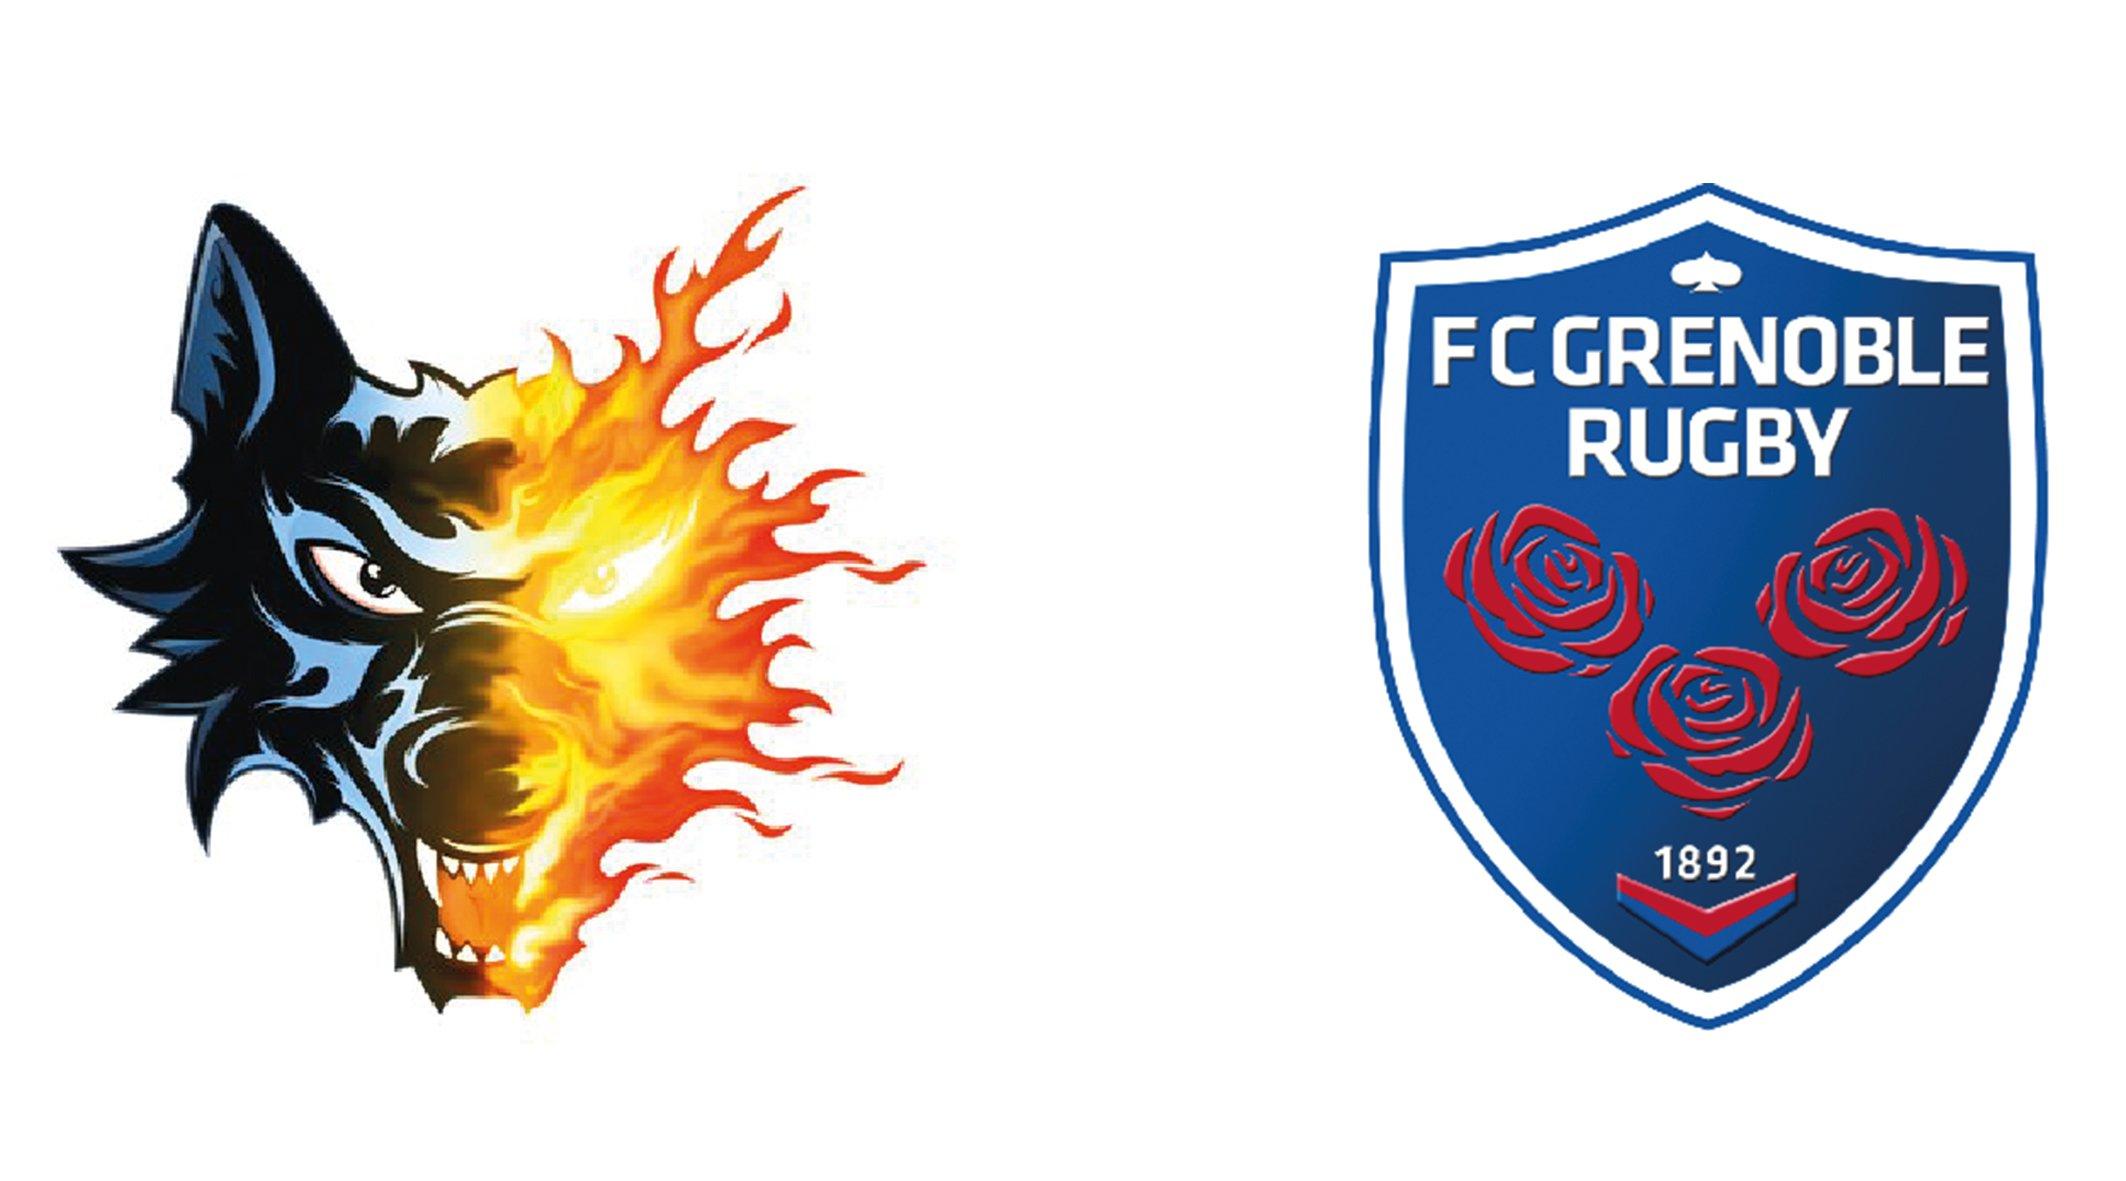 Grenoble_rugby_hockey_FCG38_Bruleurs_de_loup_sports